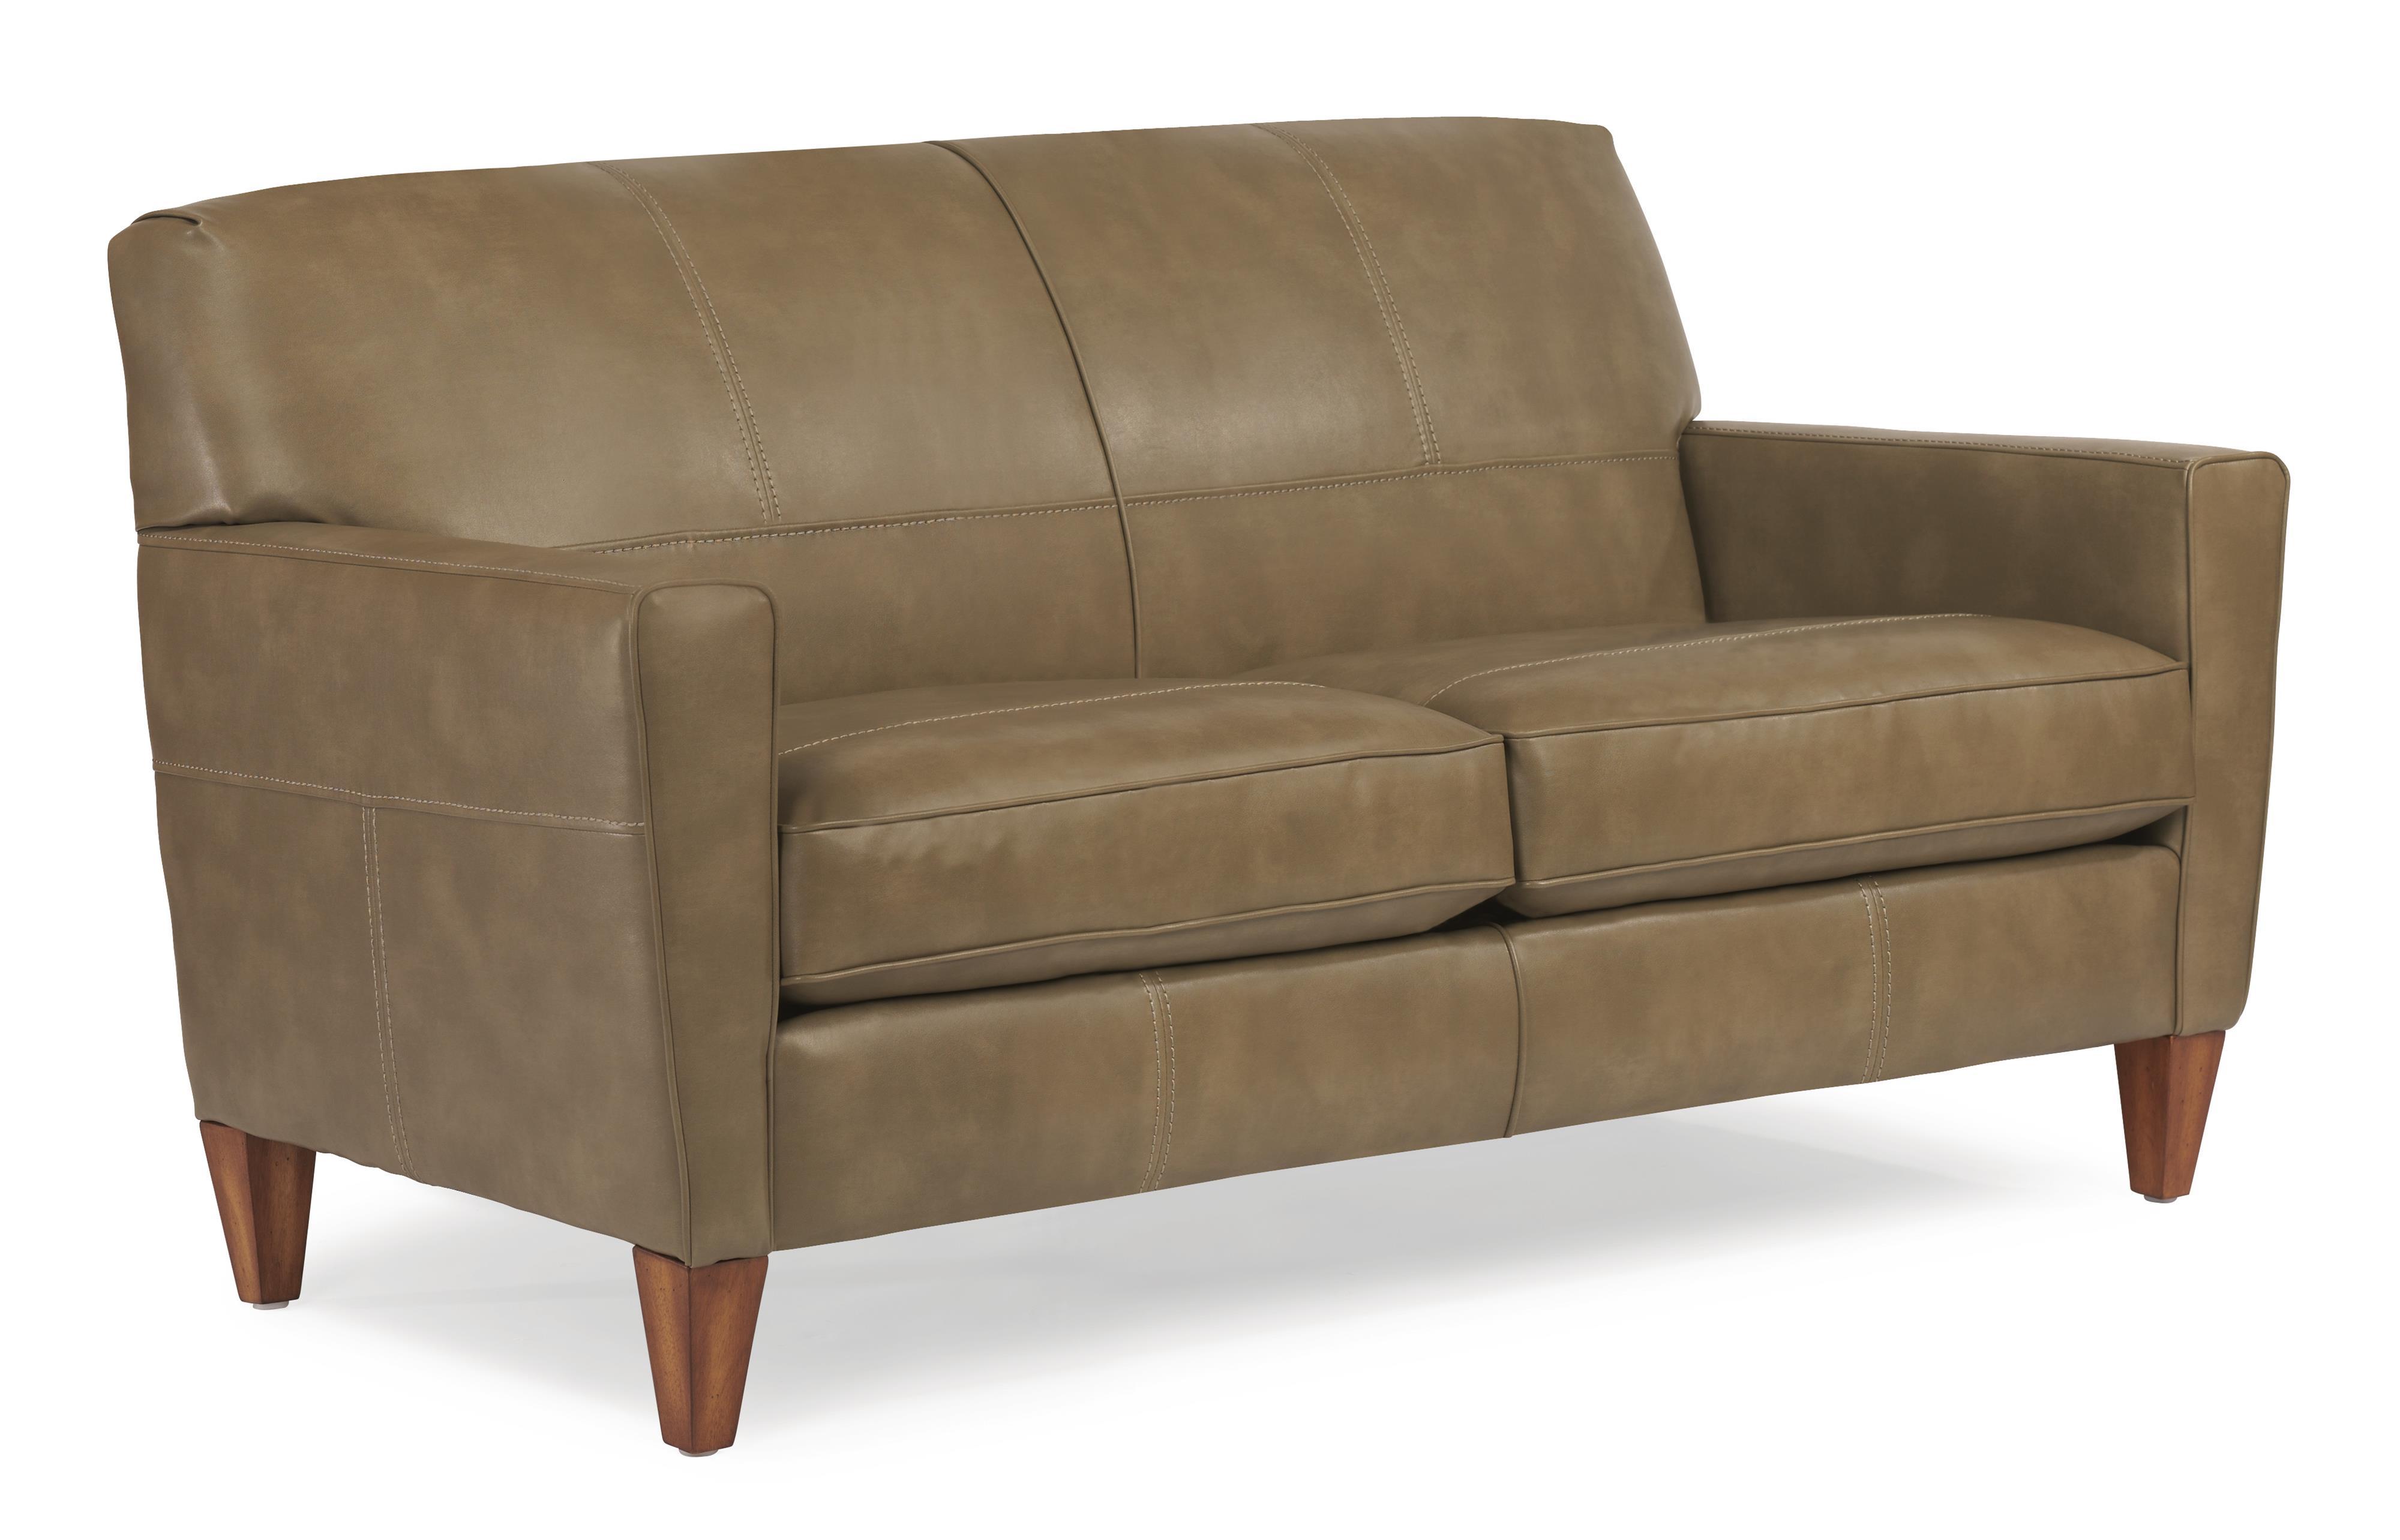 "Flexsteel Digby 70"" Sofa w/ Two Cushions - Item Number: N5966-30"